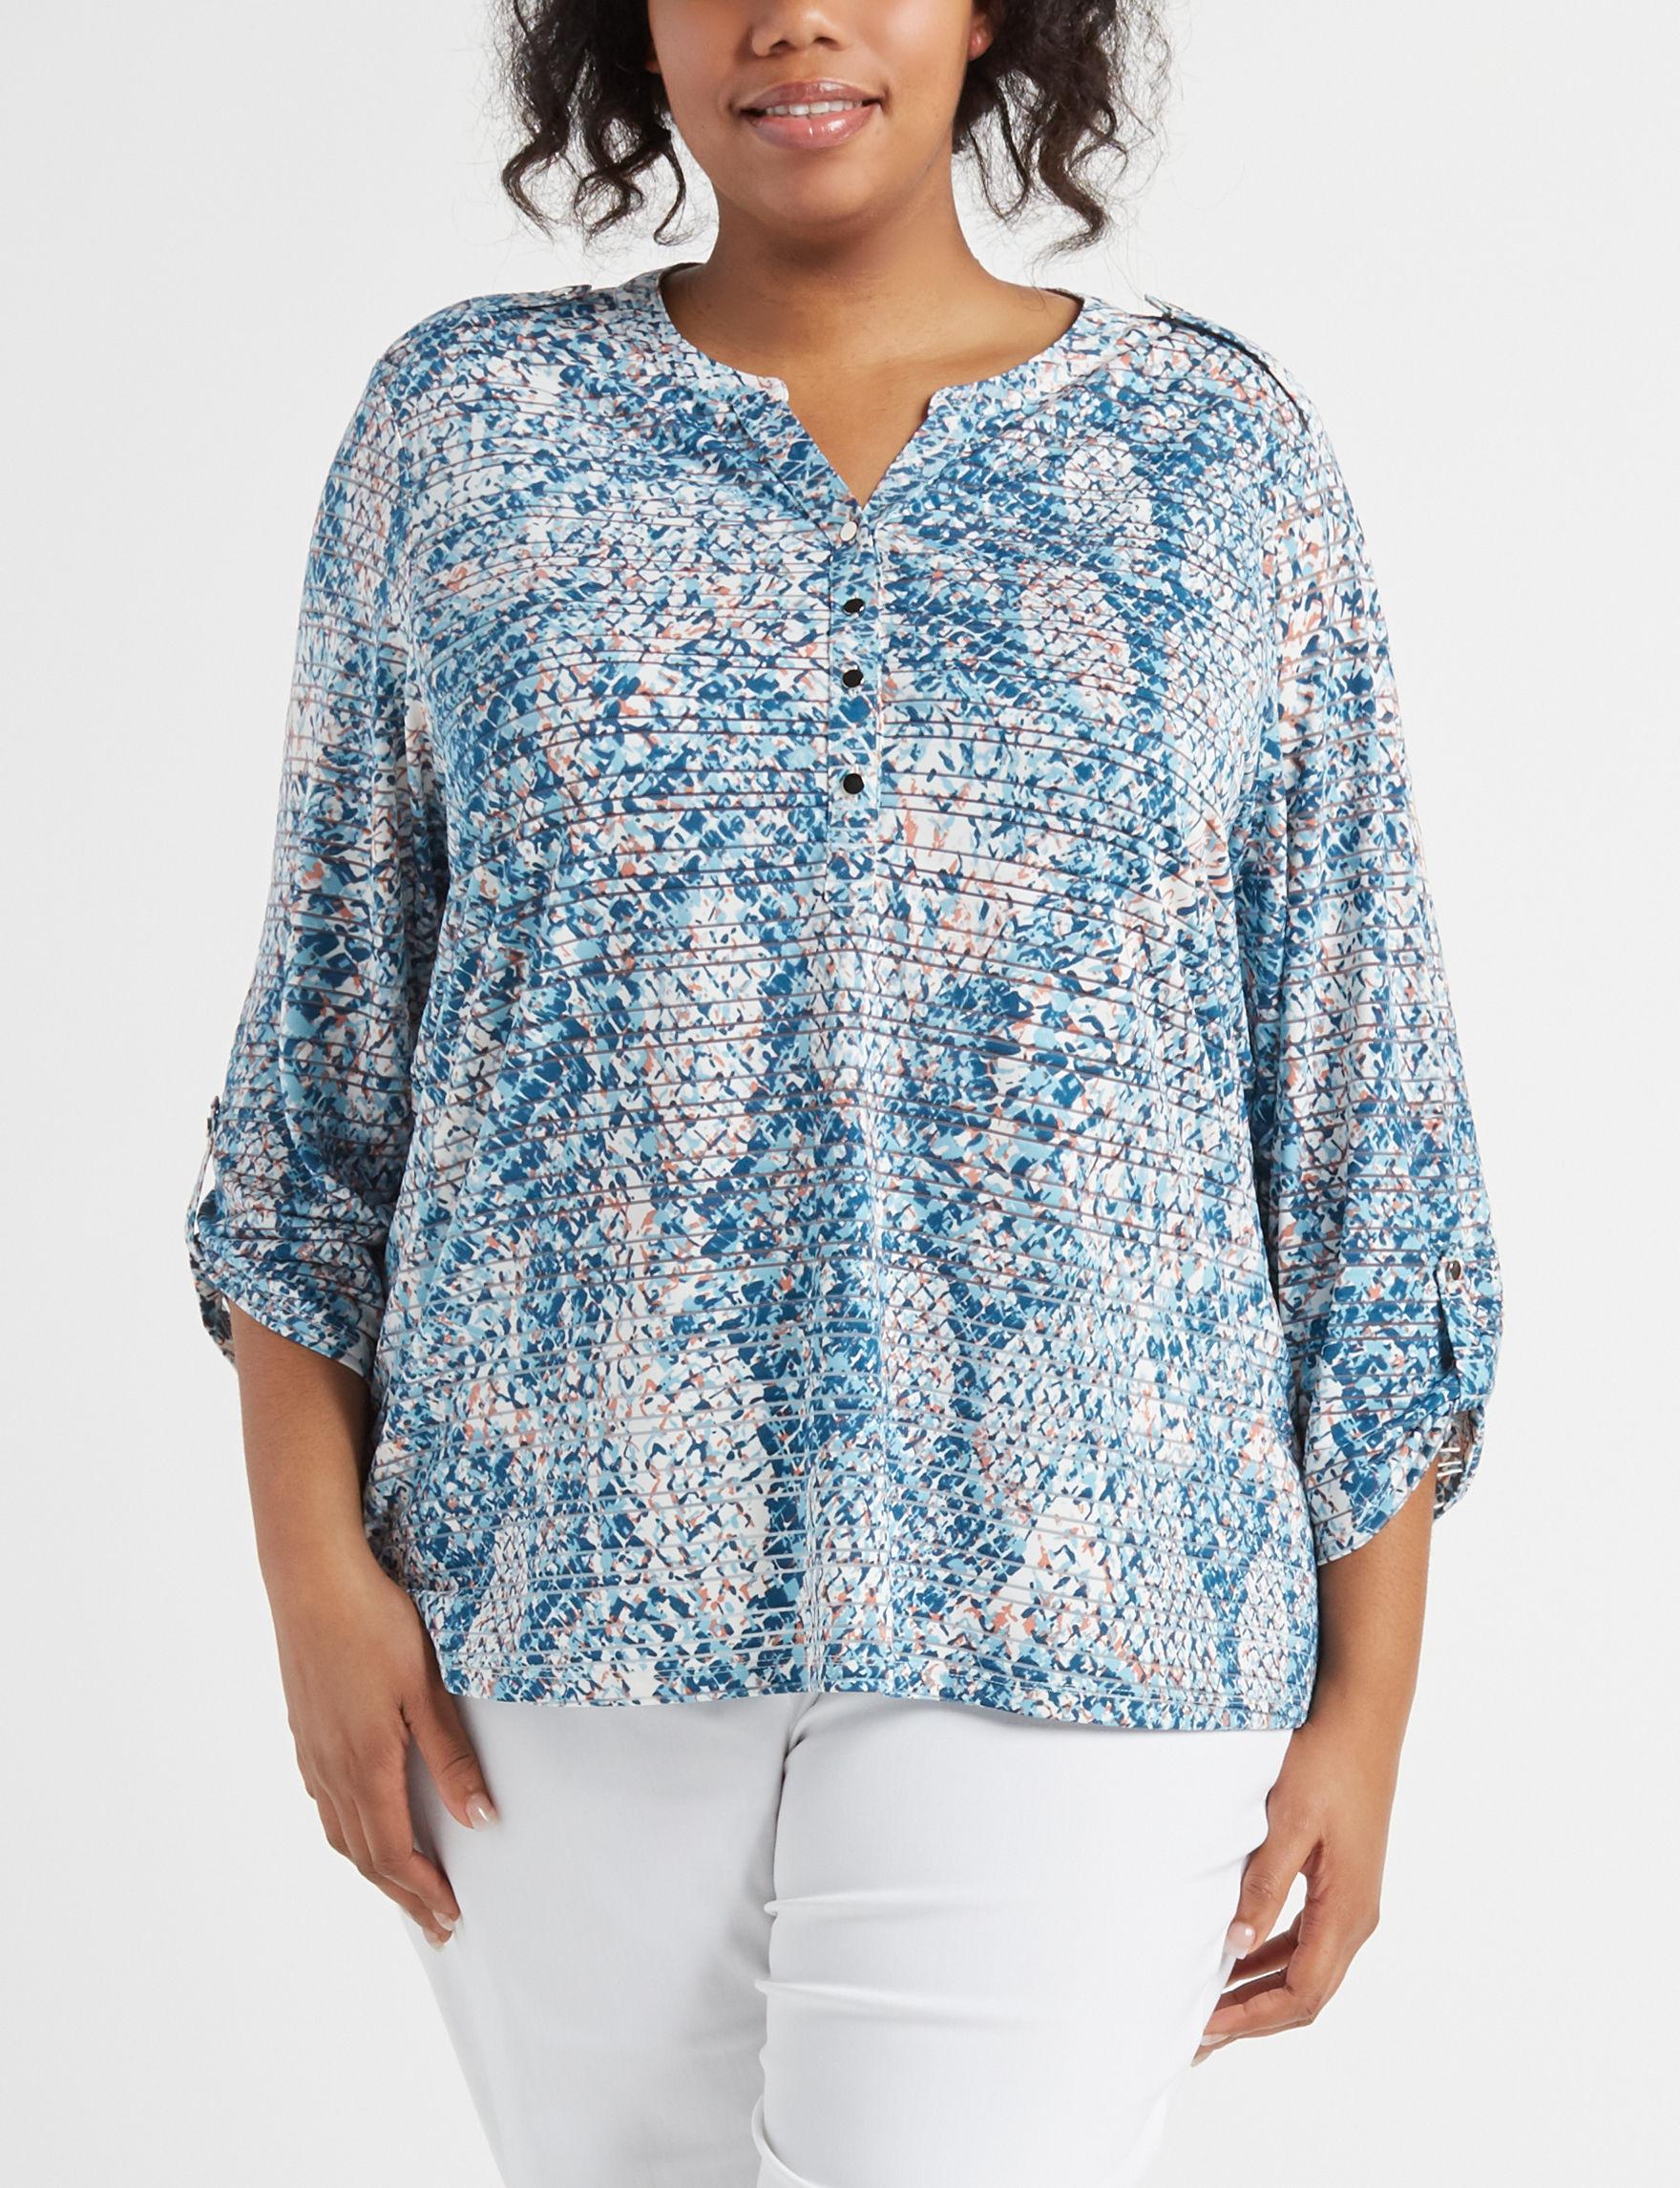 Rebecca Malone Teal / Multi Shirts & Blouses